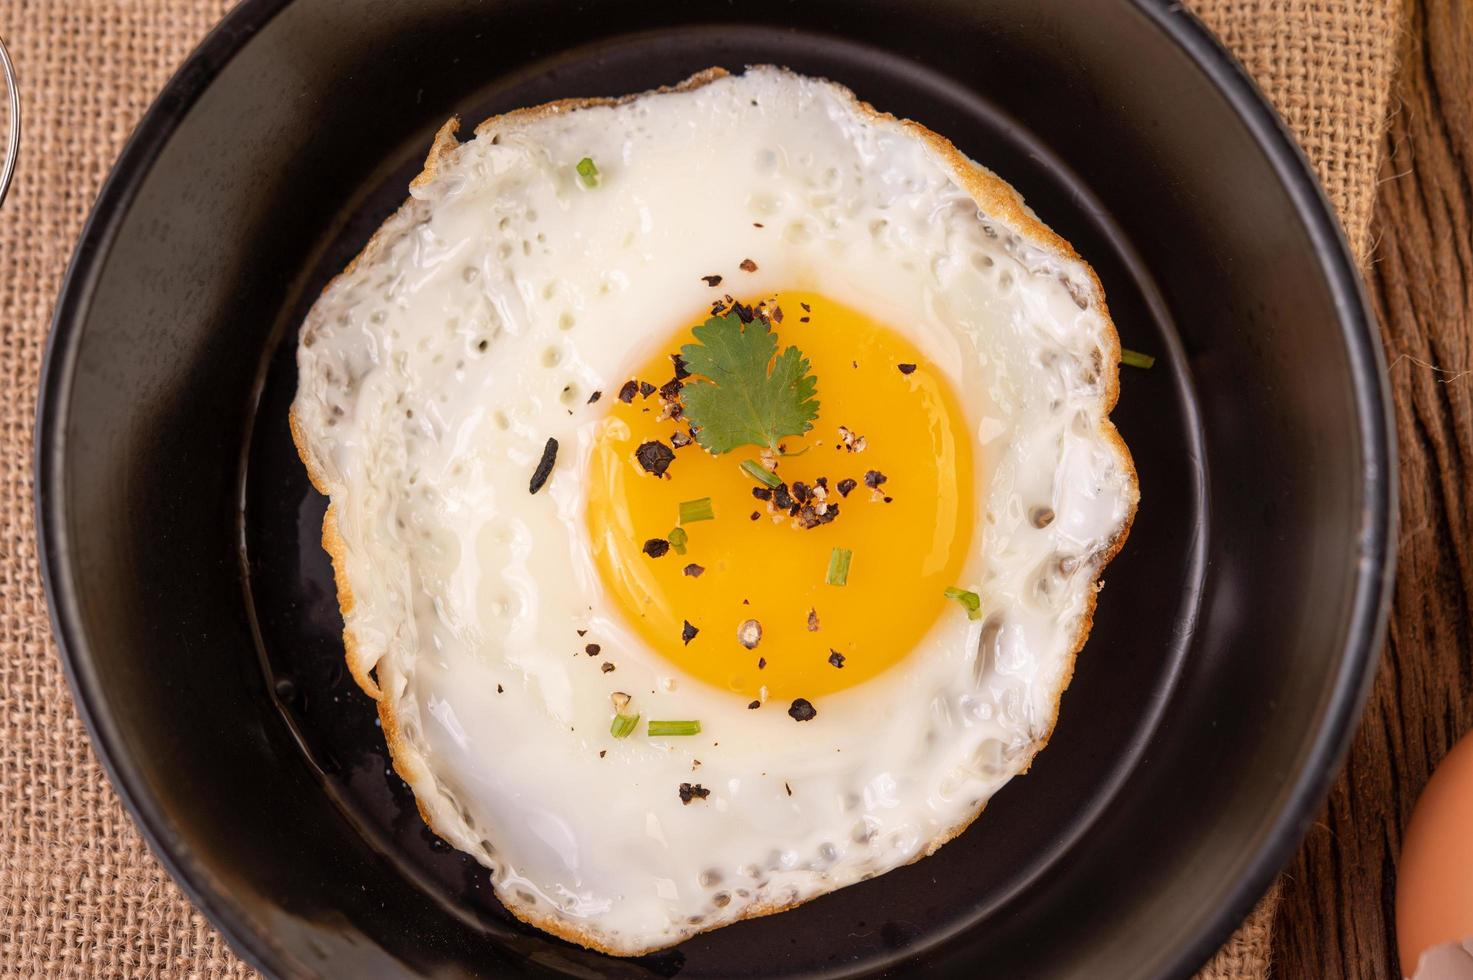 gebakken ei ontbijt foto